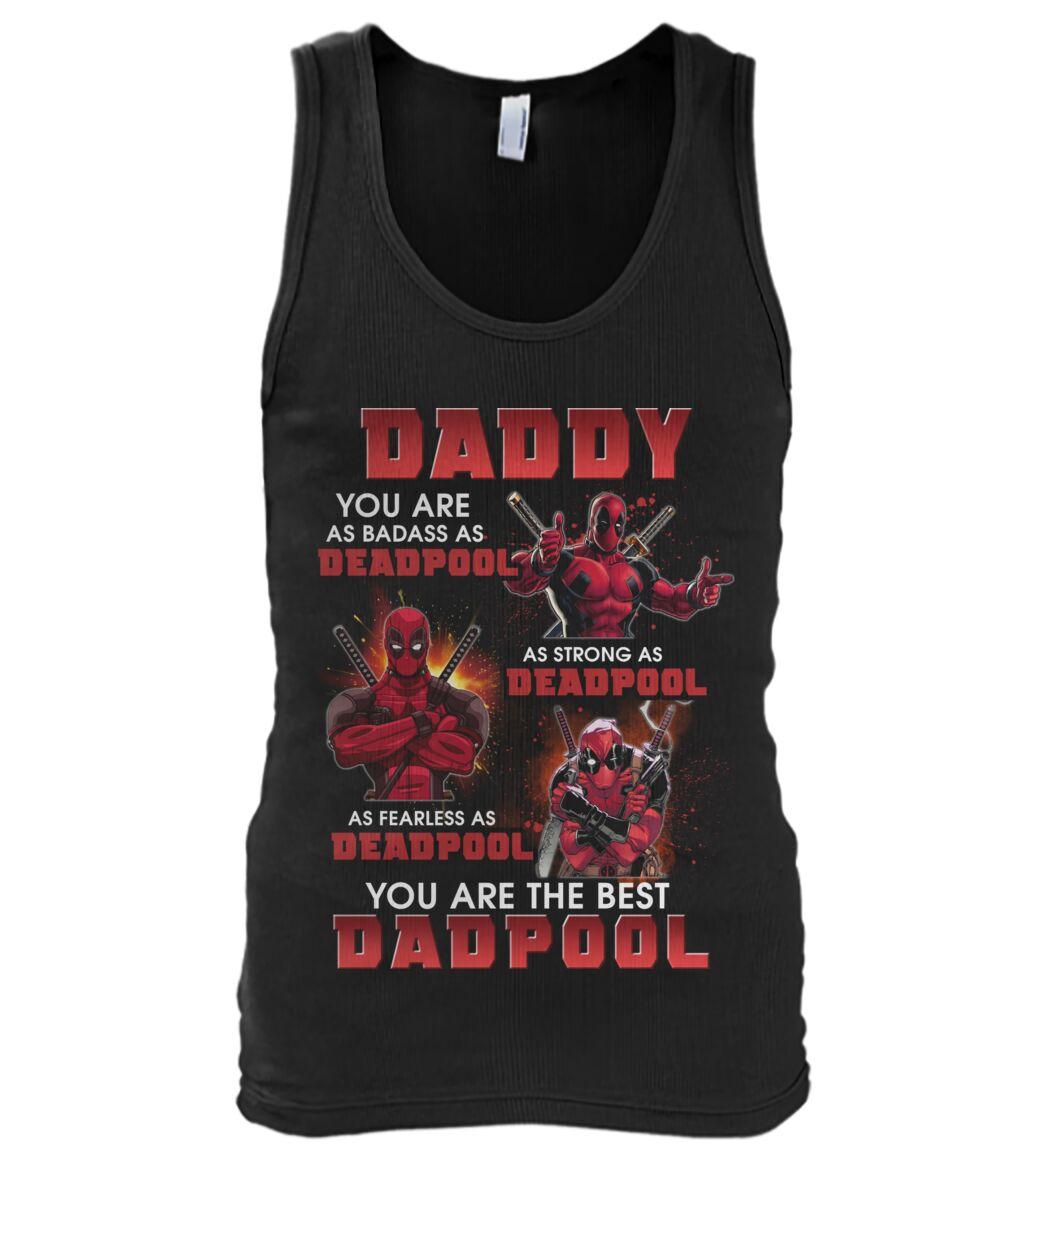 Daddy You Are As BaDass As Deadpool As Strong As Deadpool shirt 13